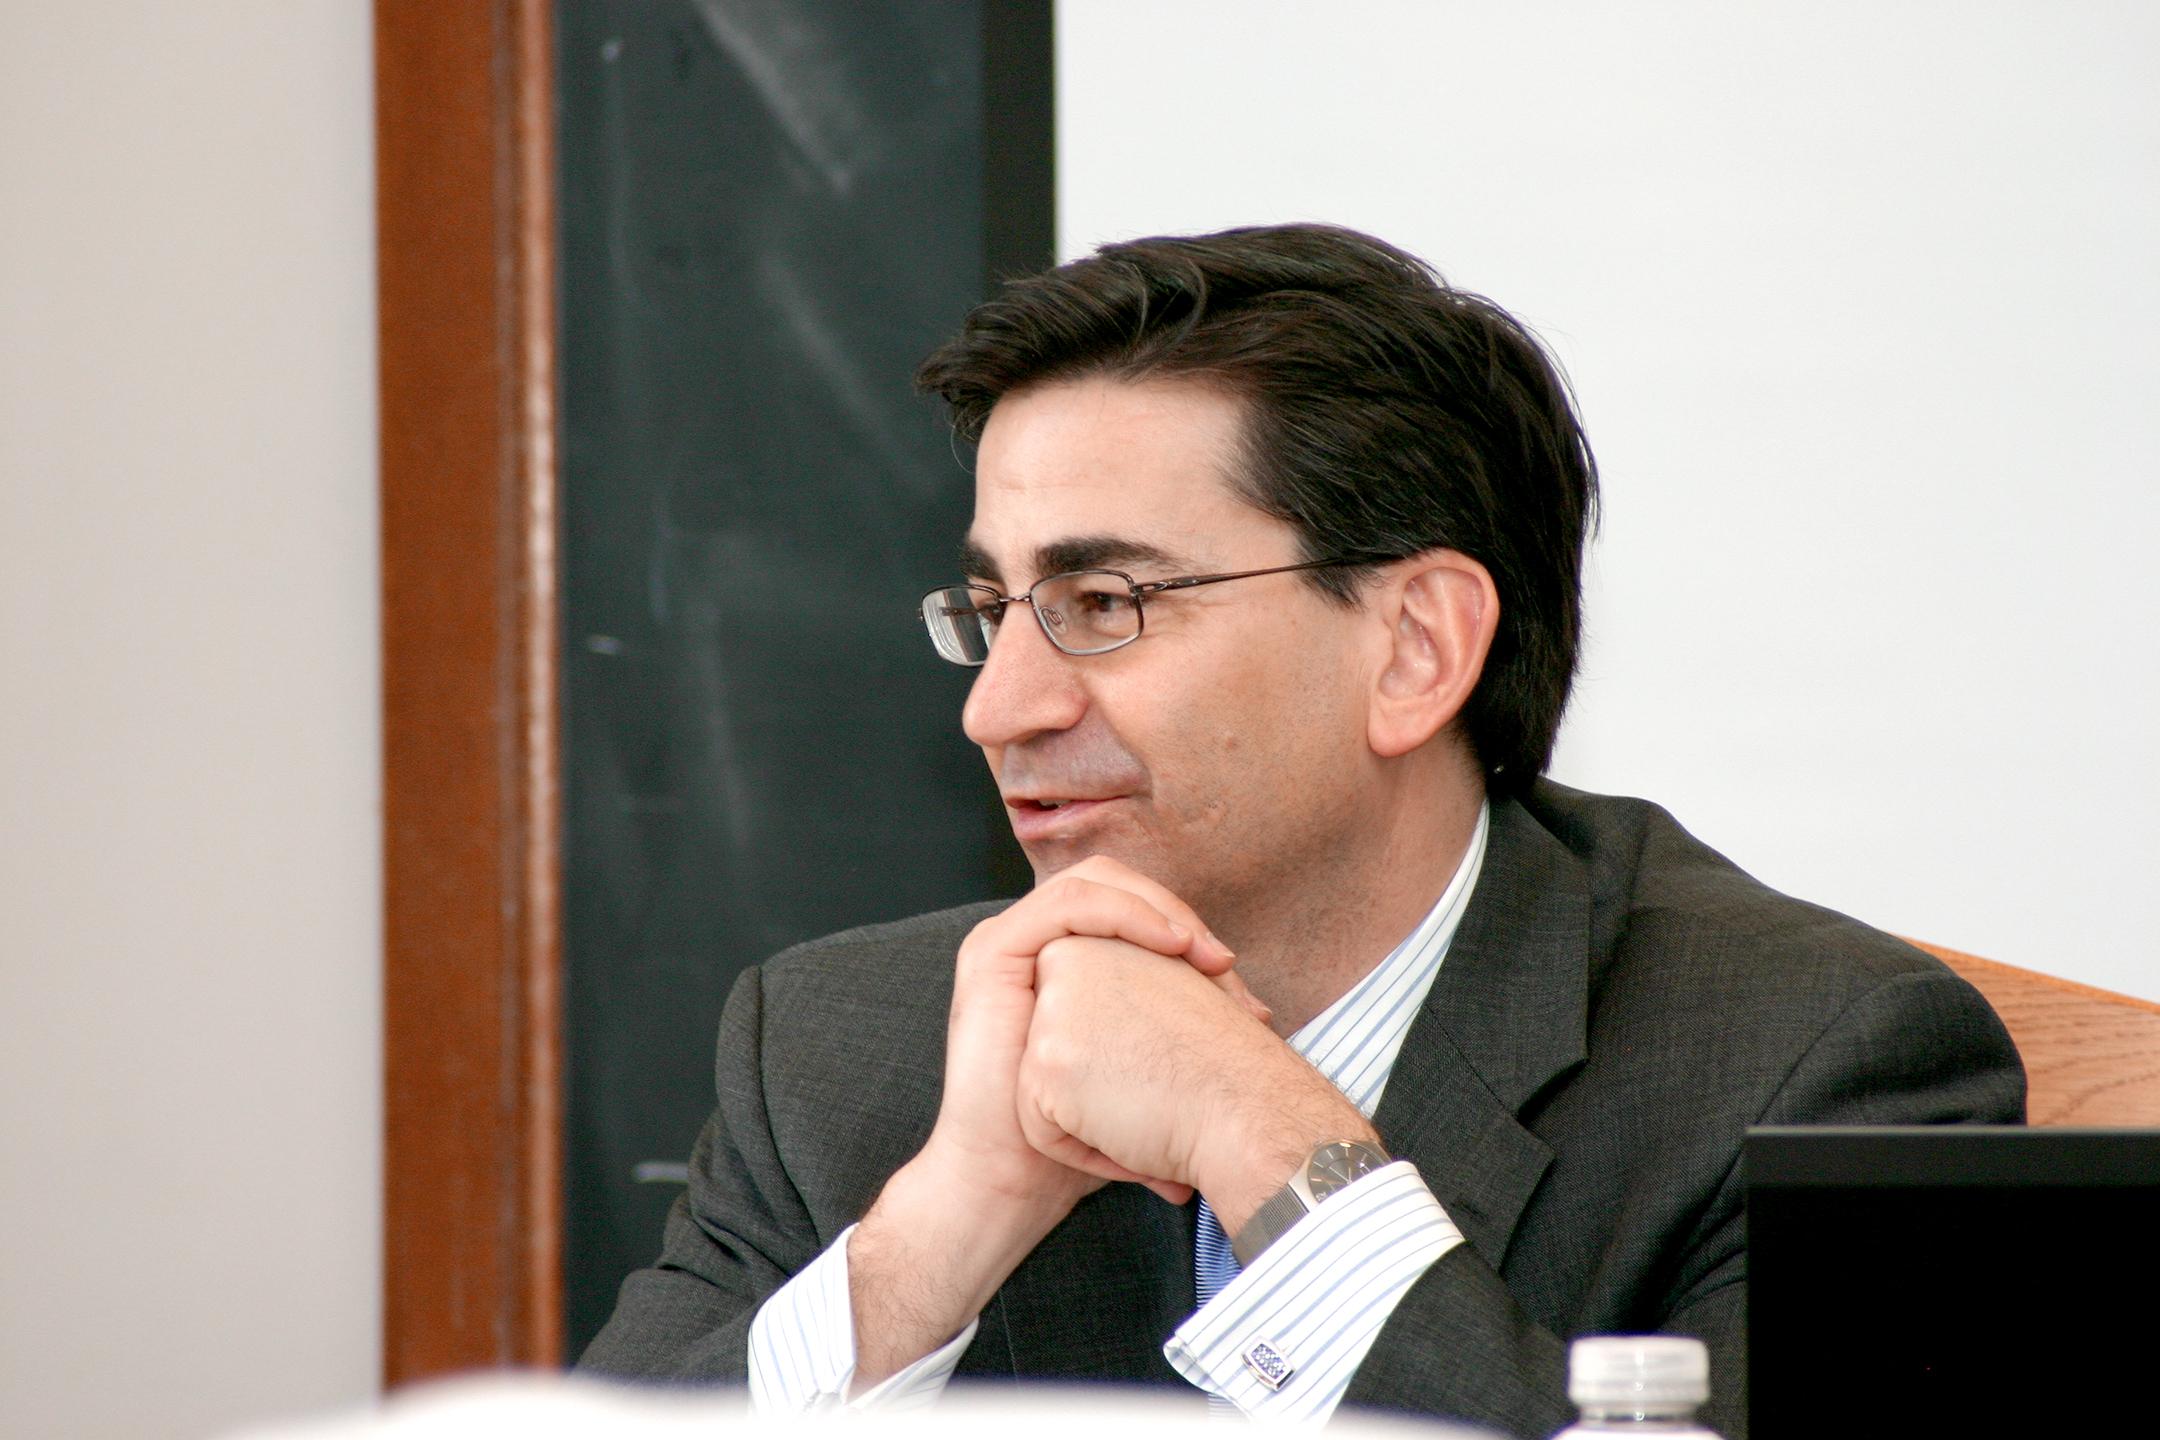 Frank R. Jimenez '91